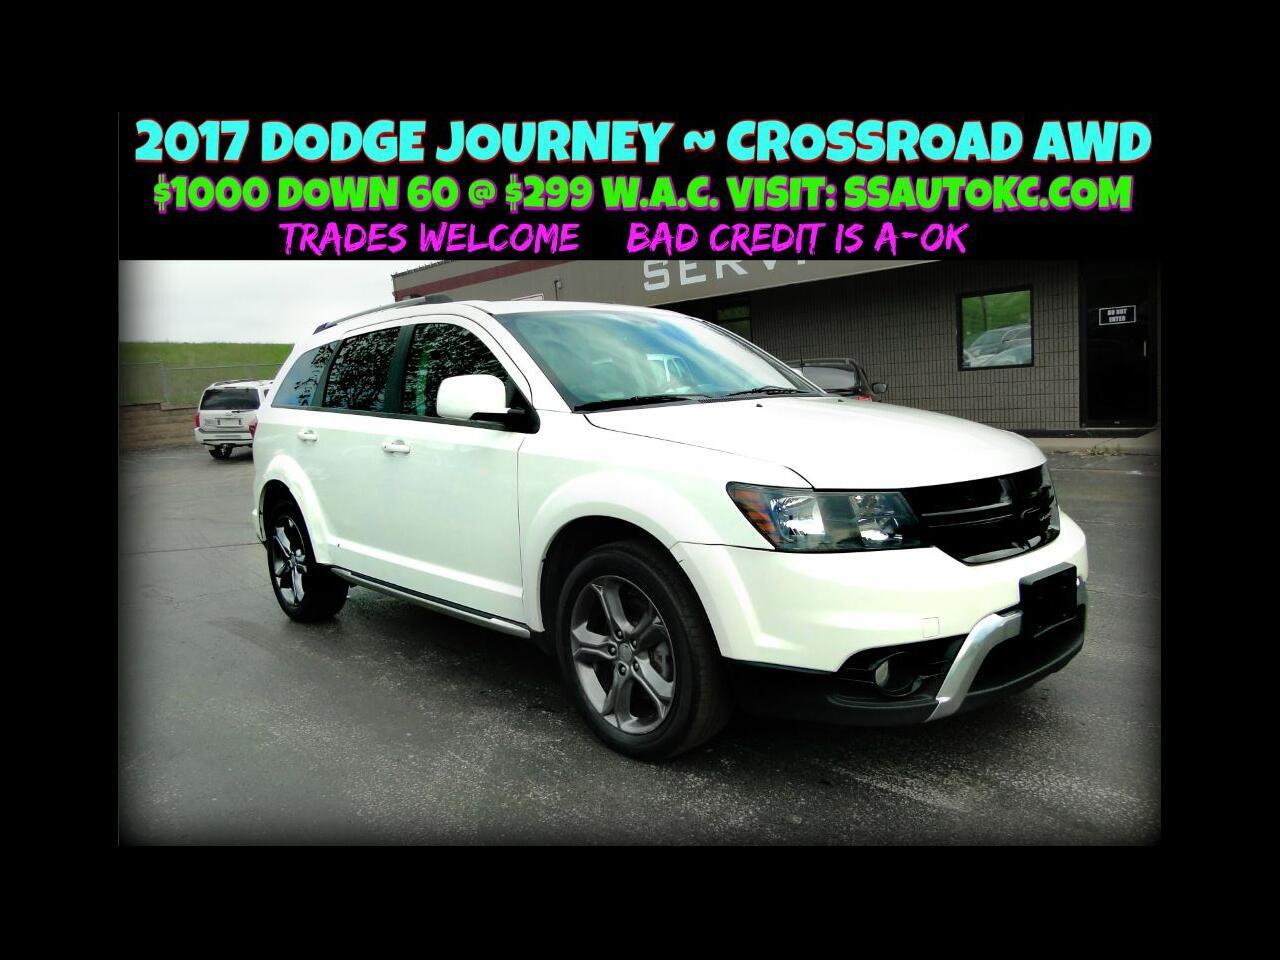 Dodge Journey Crossroad AWD 2017